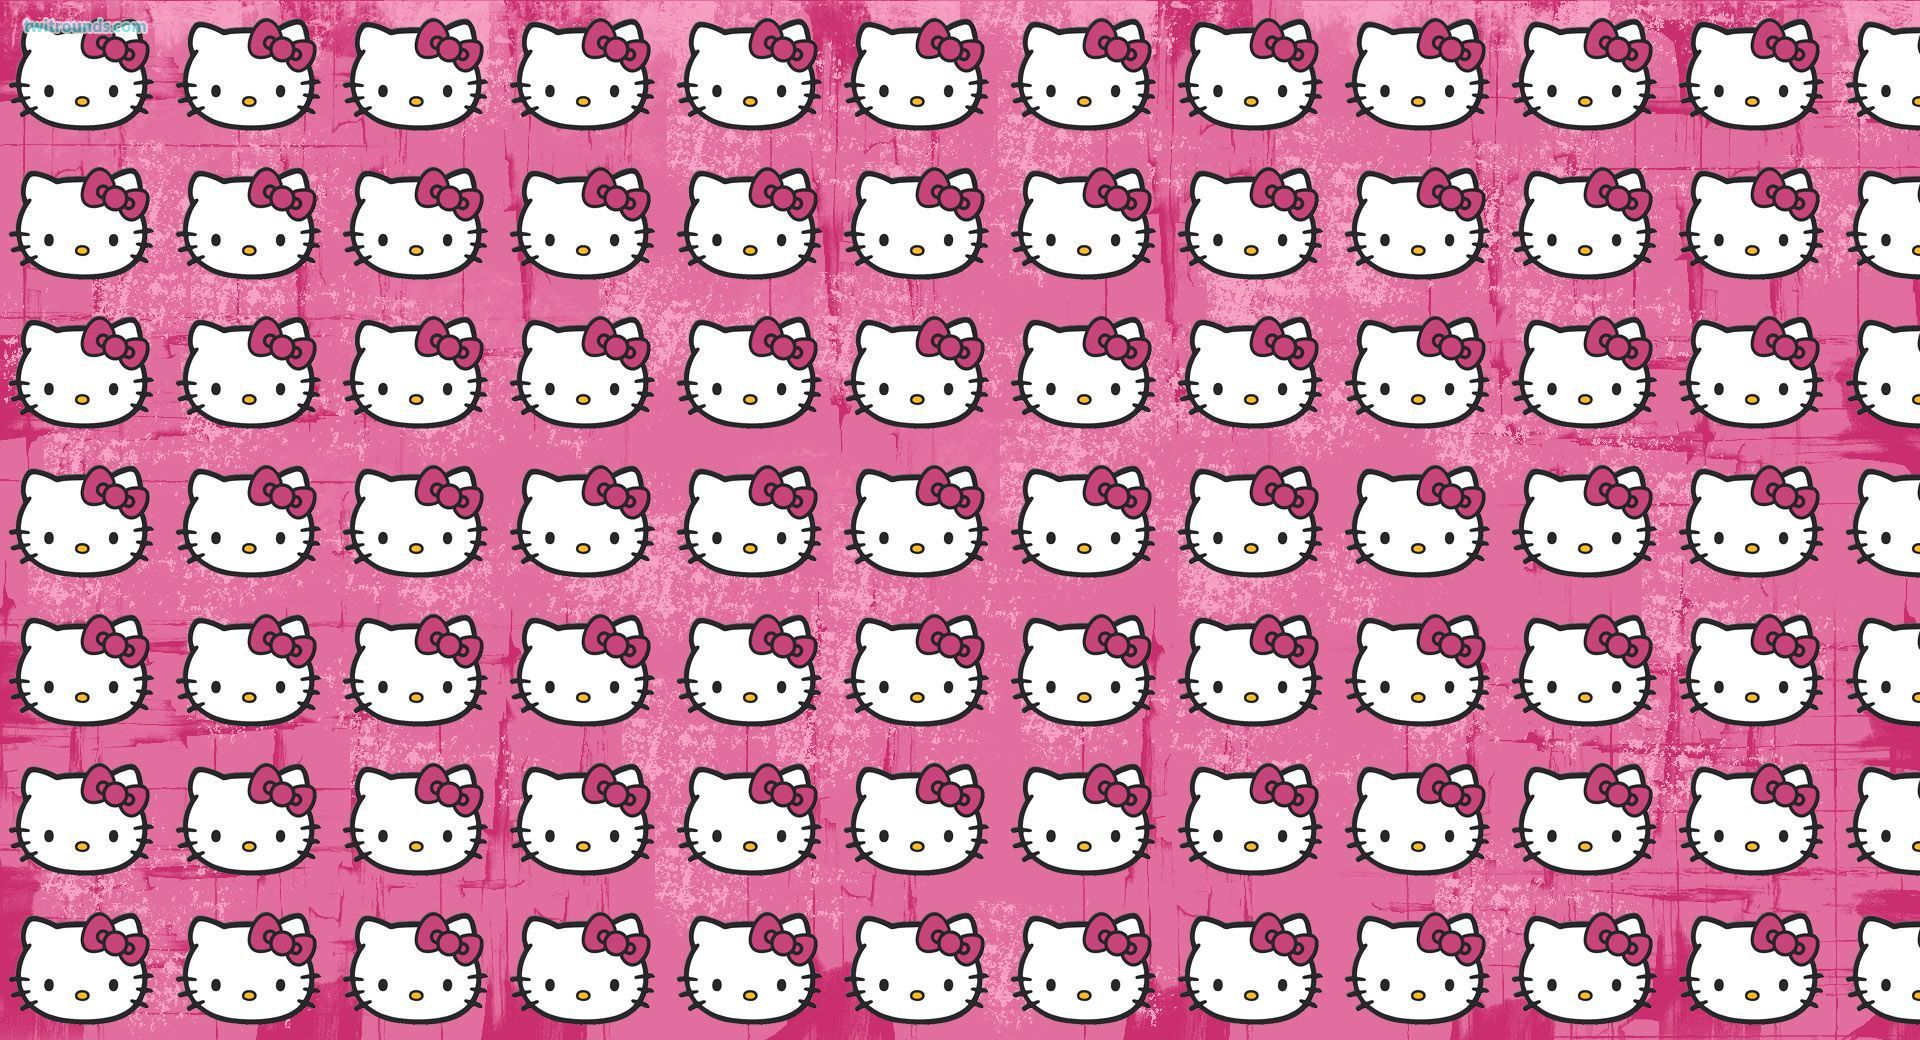 Desktop Background Hello Kitty Wallpaper 3d Doraemon In 2020 Hello Kitty Wallpaper Hd Kitty Wallpaper Hello Kitty Wallpaper